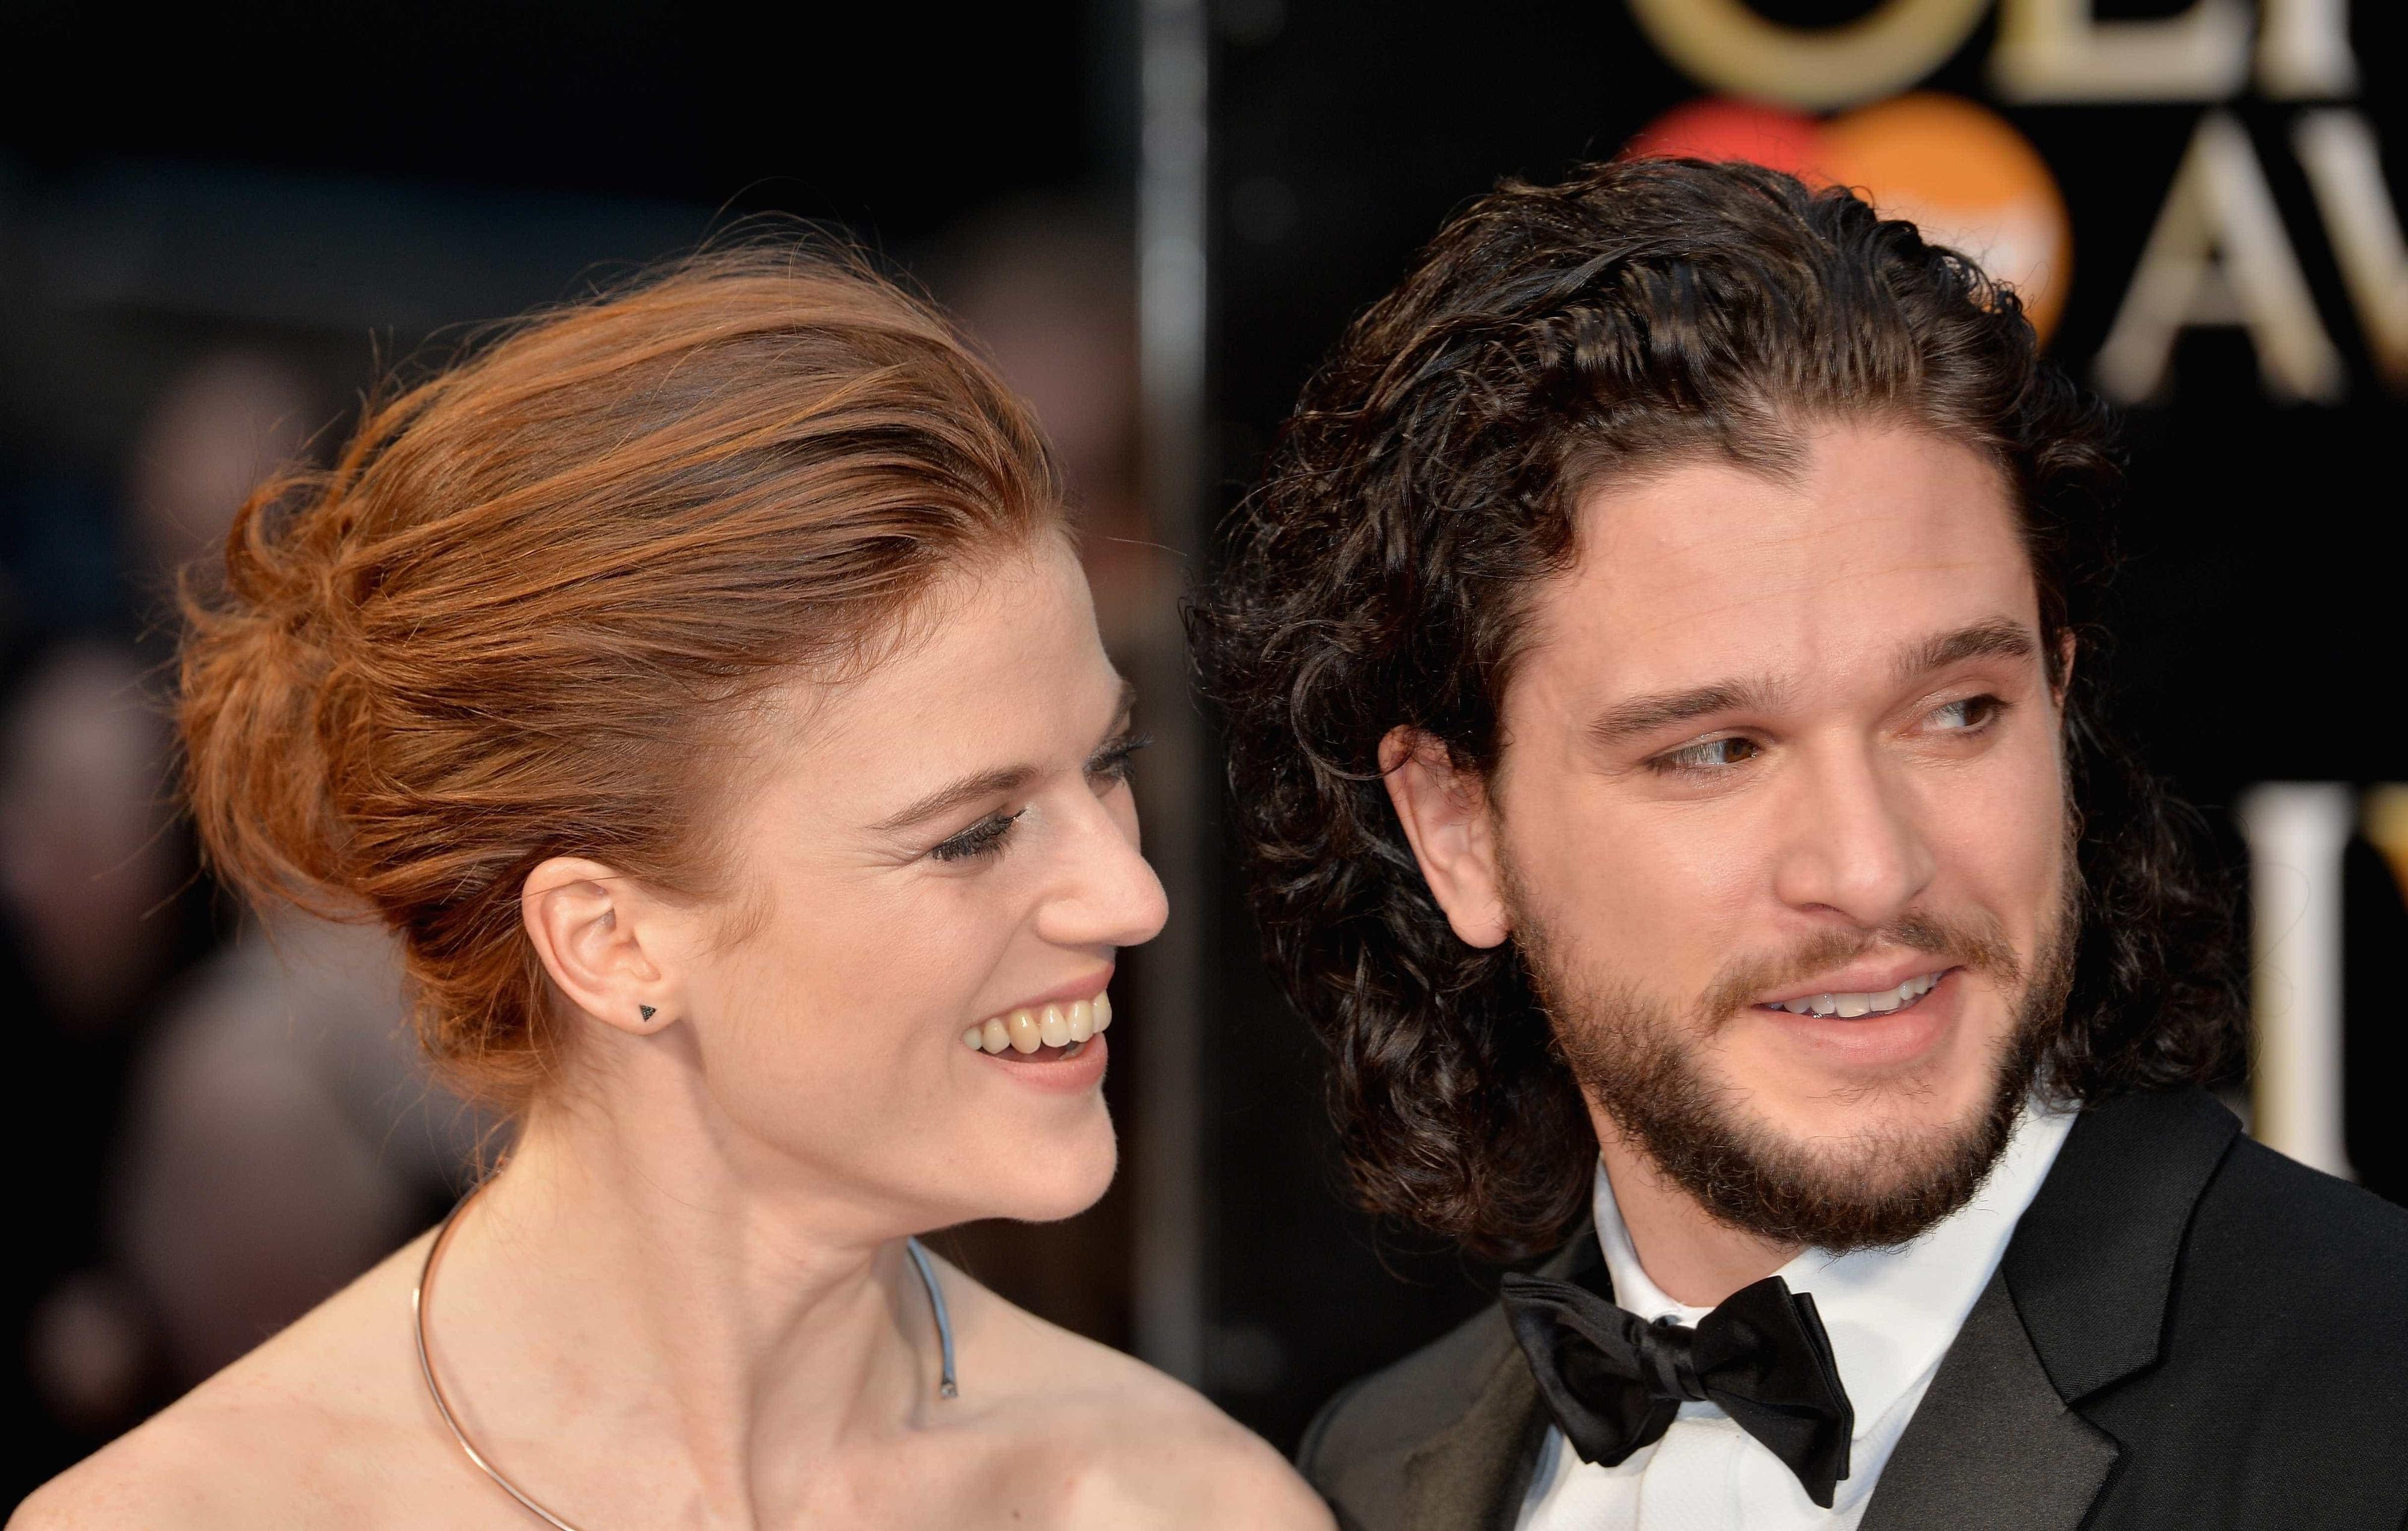 Revelada data de casamento dos atores de 'Game of Thrones'